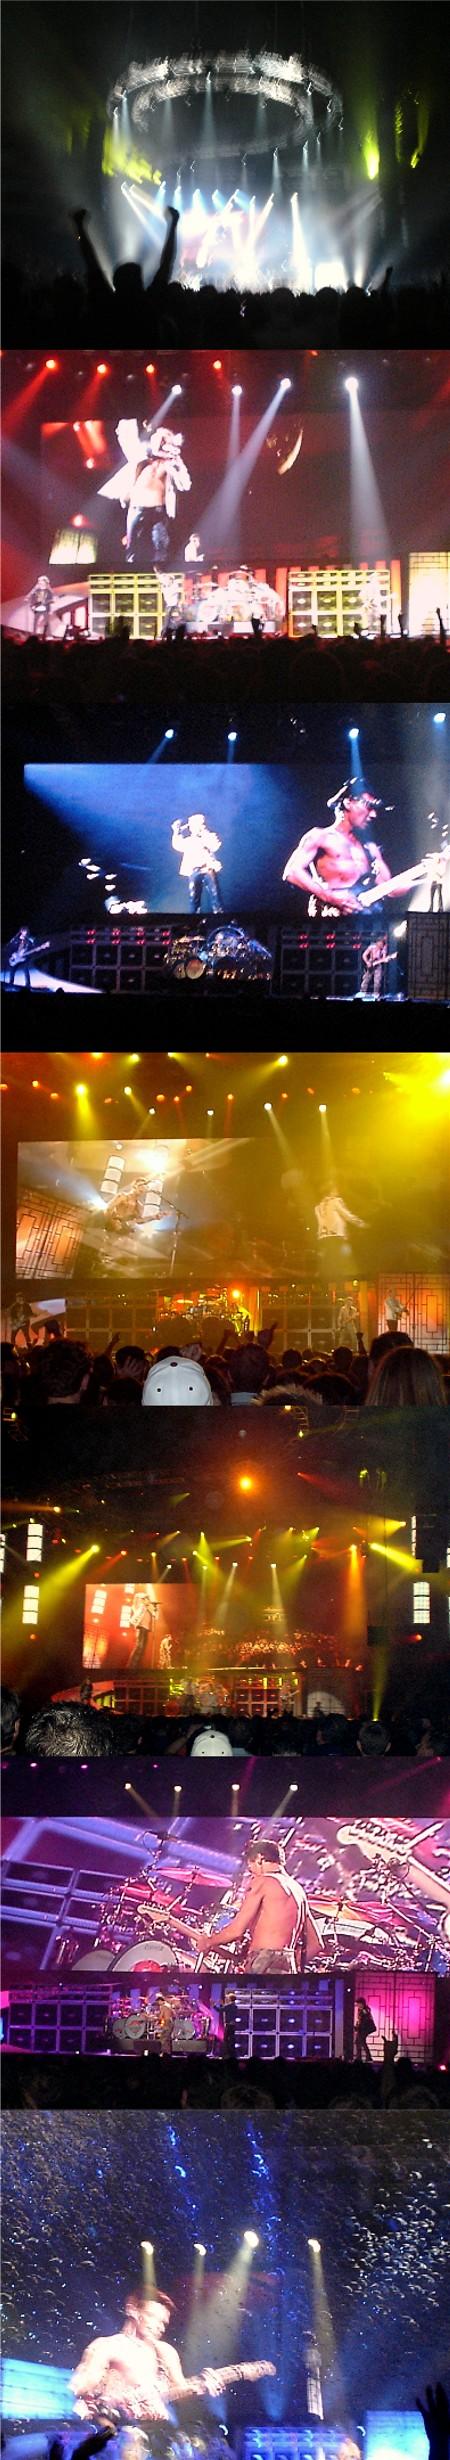 VH_Oct_24_2007_Strip (332k image)